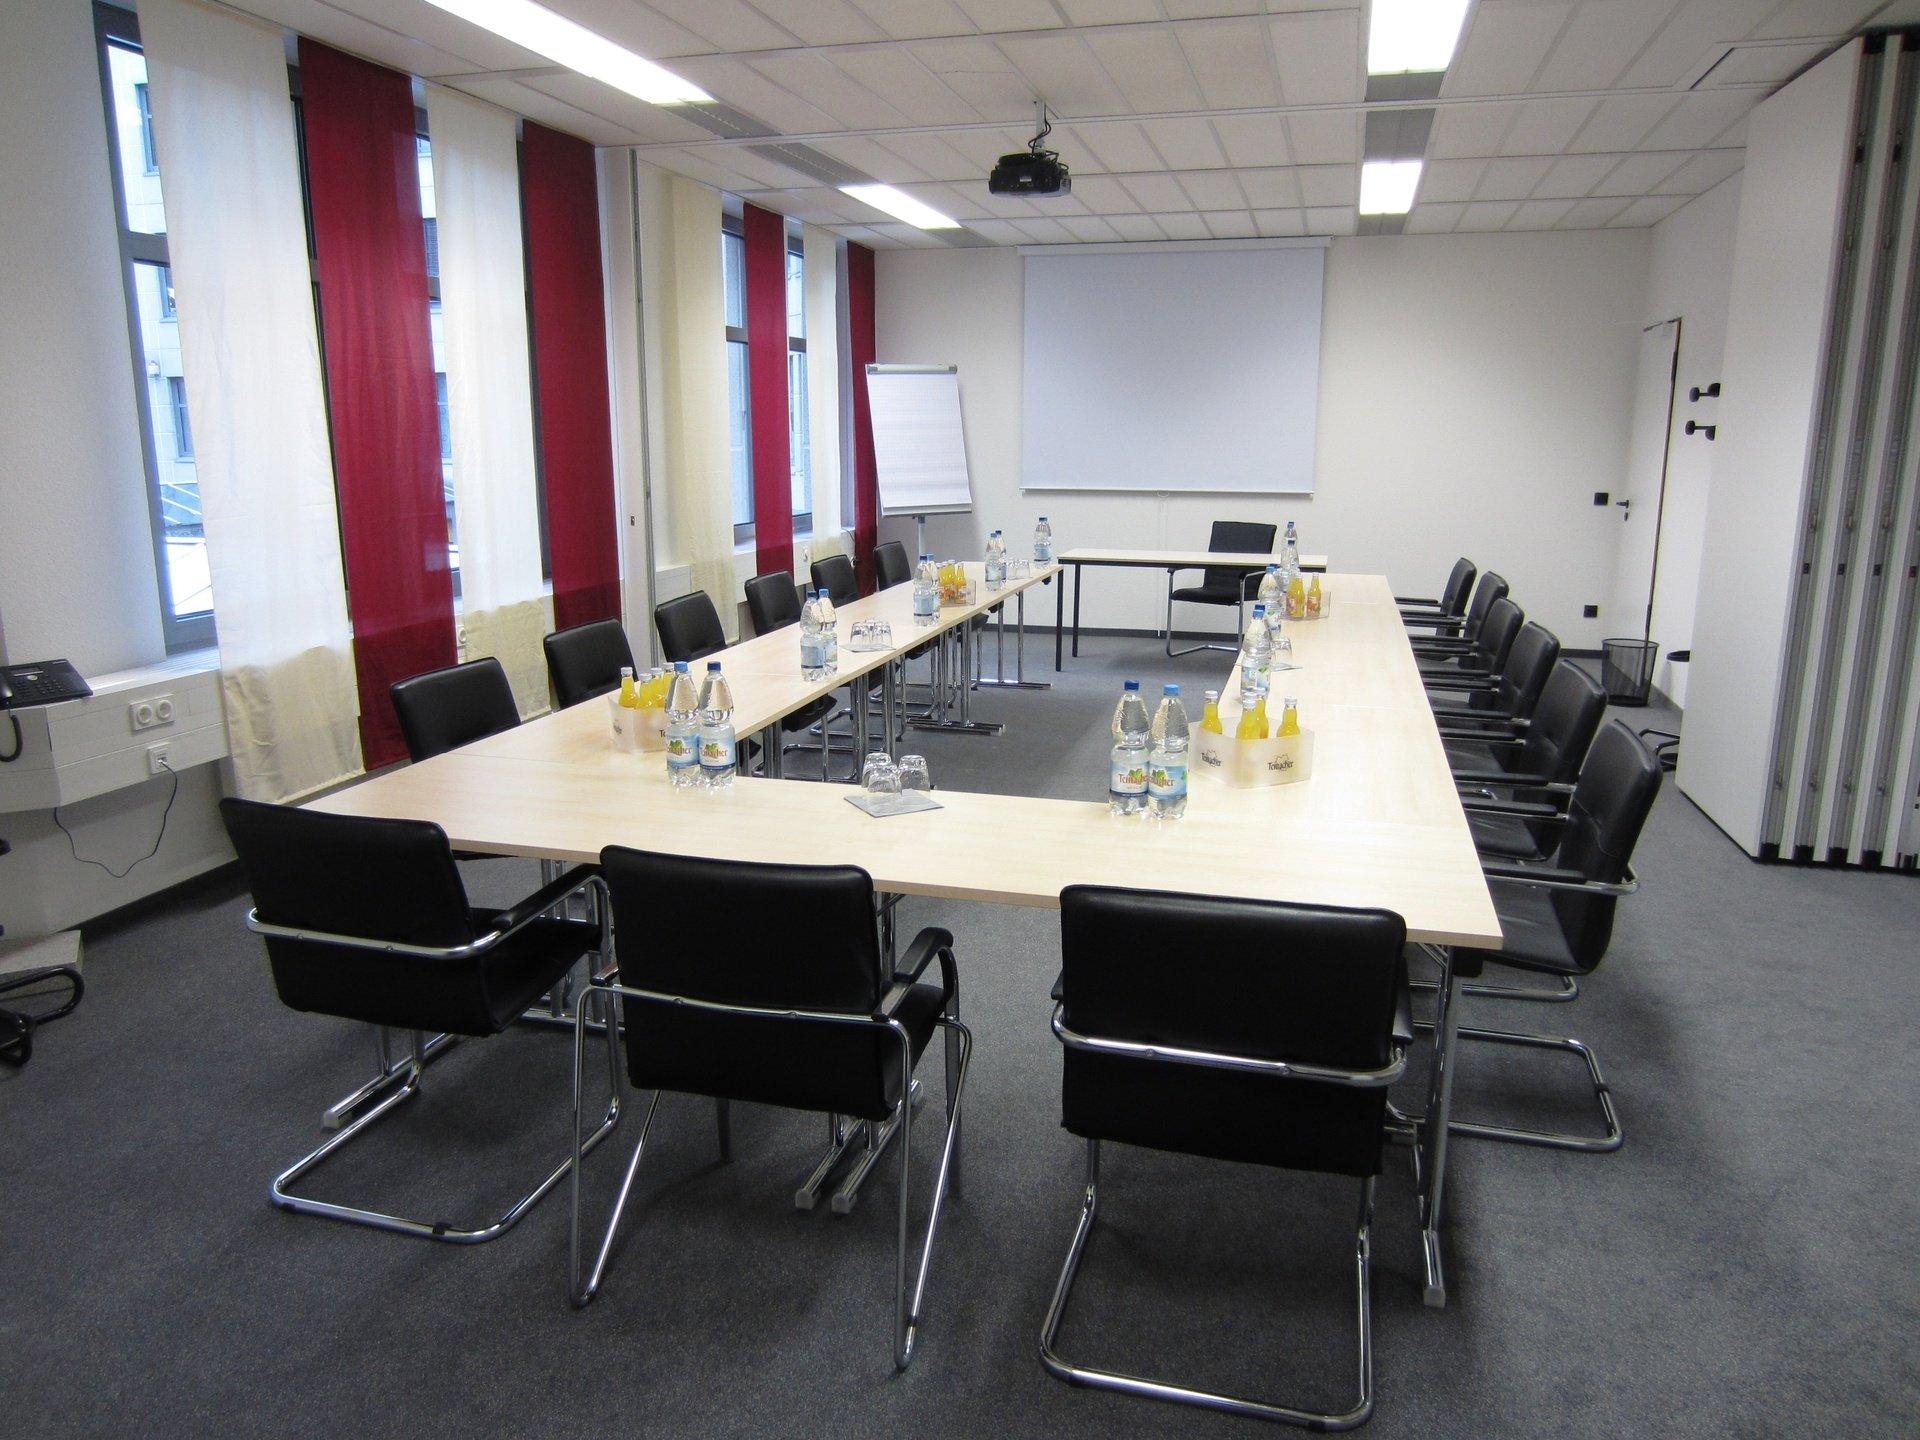 Stuttgart seminar rooms Meeting room Business Center Airport Seminarraum Airport image 0